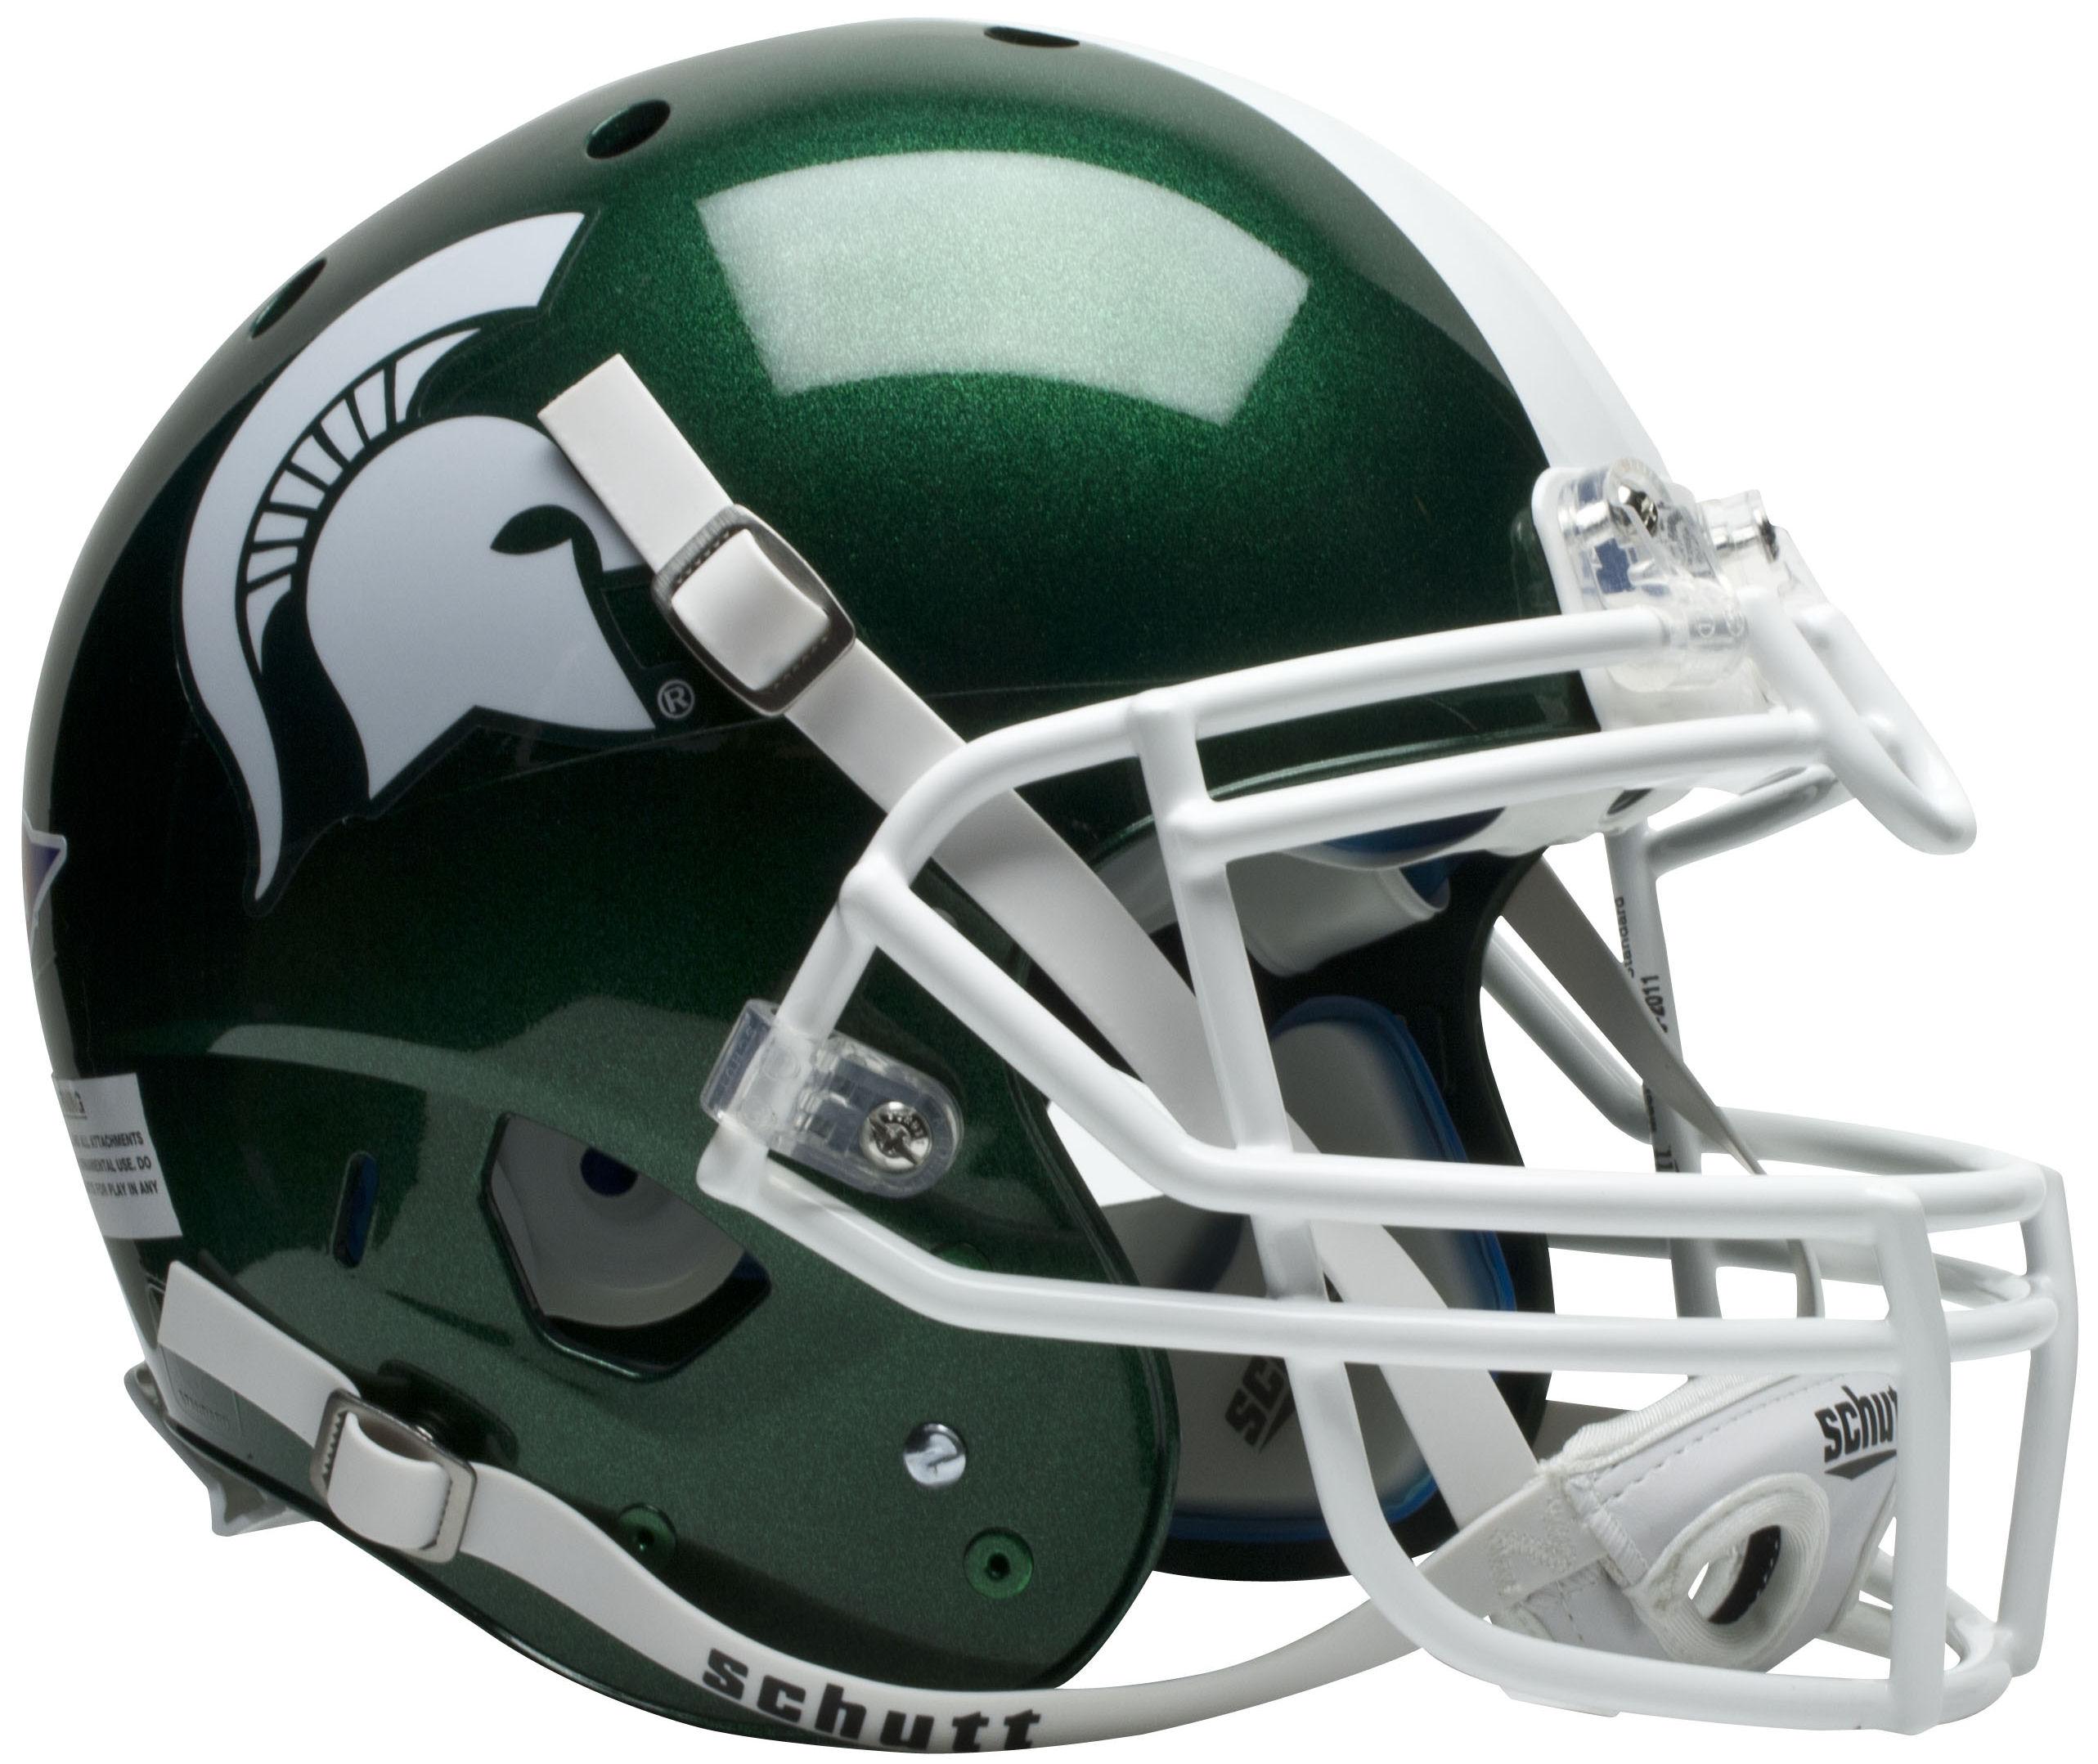 Michigan State Spartans Authentic College XP Football Helmet Schutt